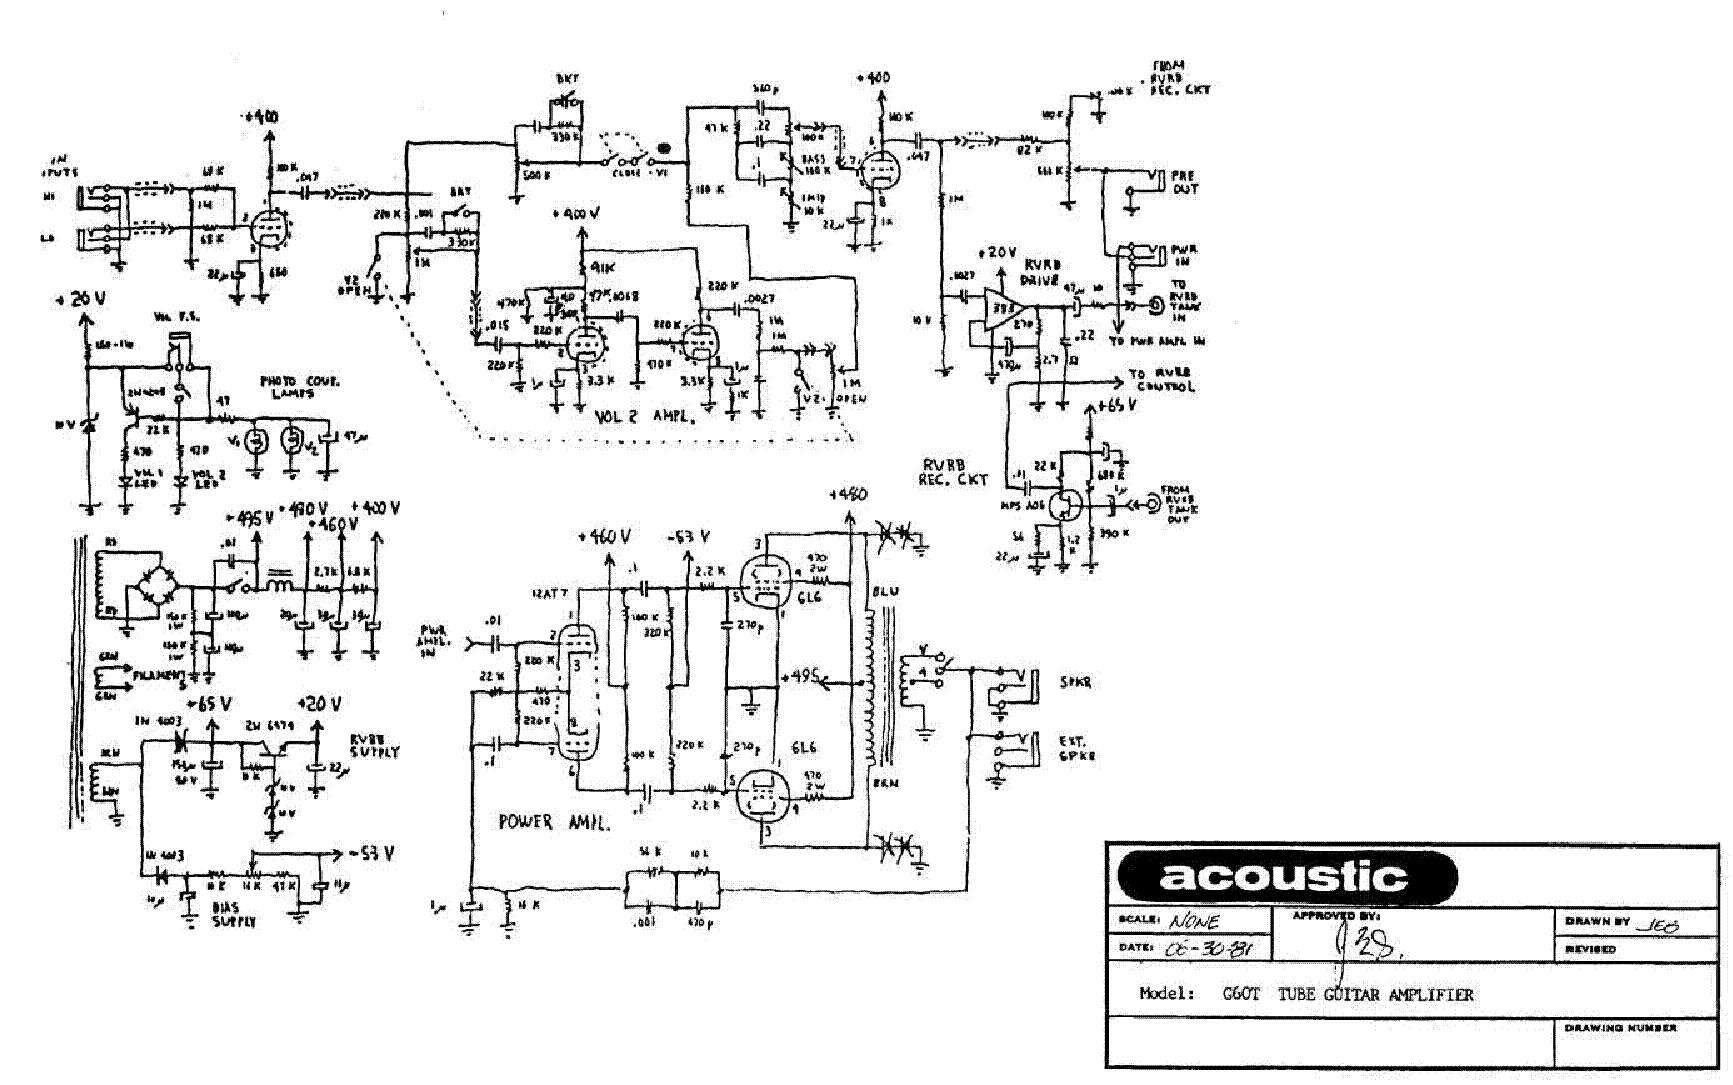 [DIAGRAM_5UK]  EY_9924] Crate Guitar Amp Wiring Diagram Free Diagram | Free Download Amp Schematic |  | Weveq Shopa Mohammedshrine Librar Wiring 101